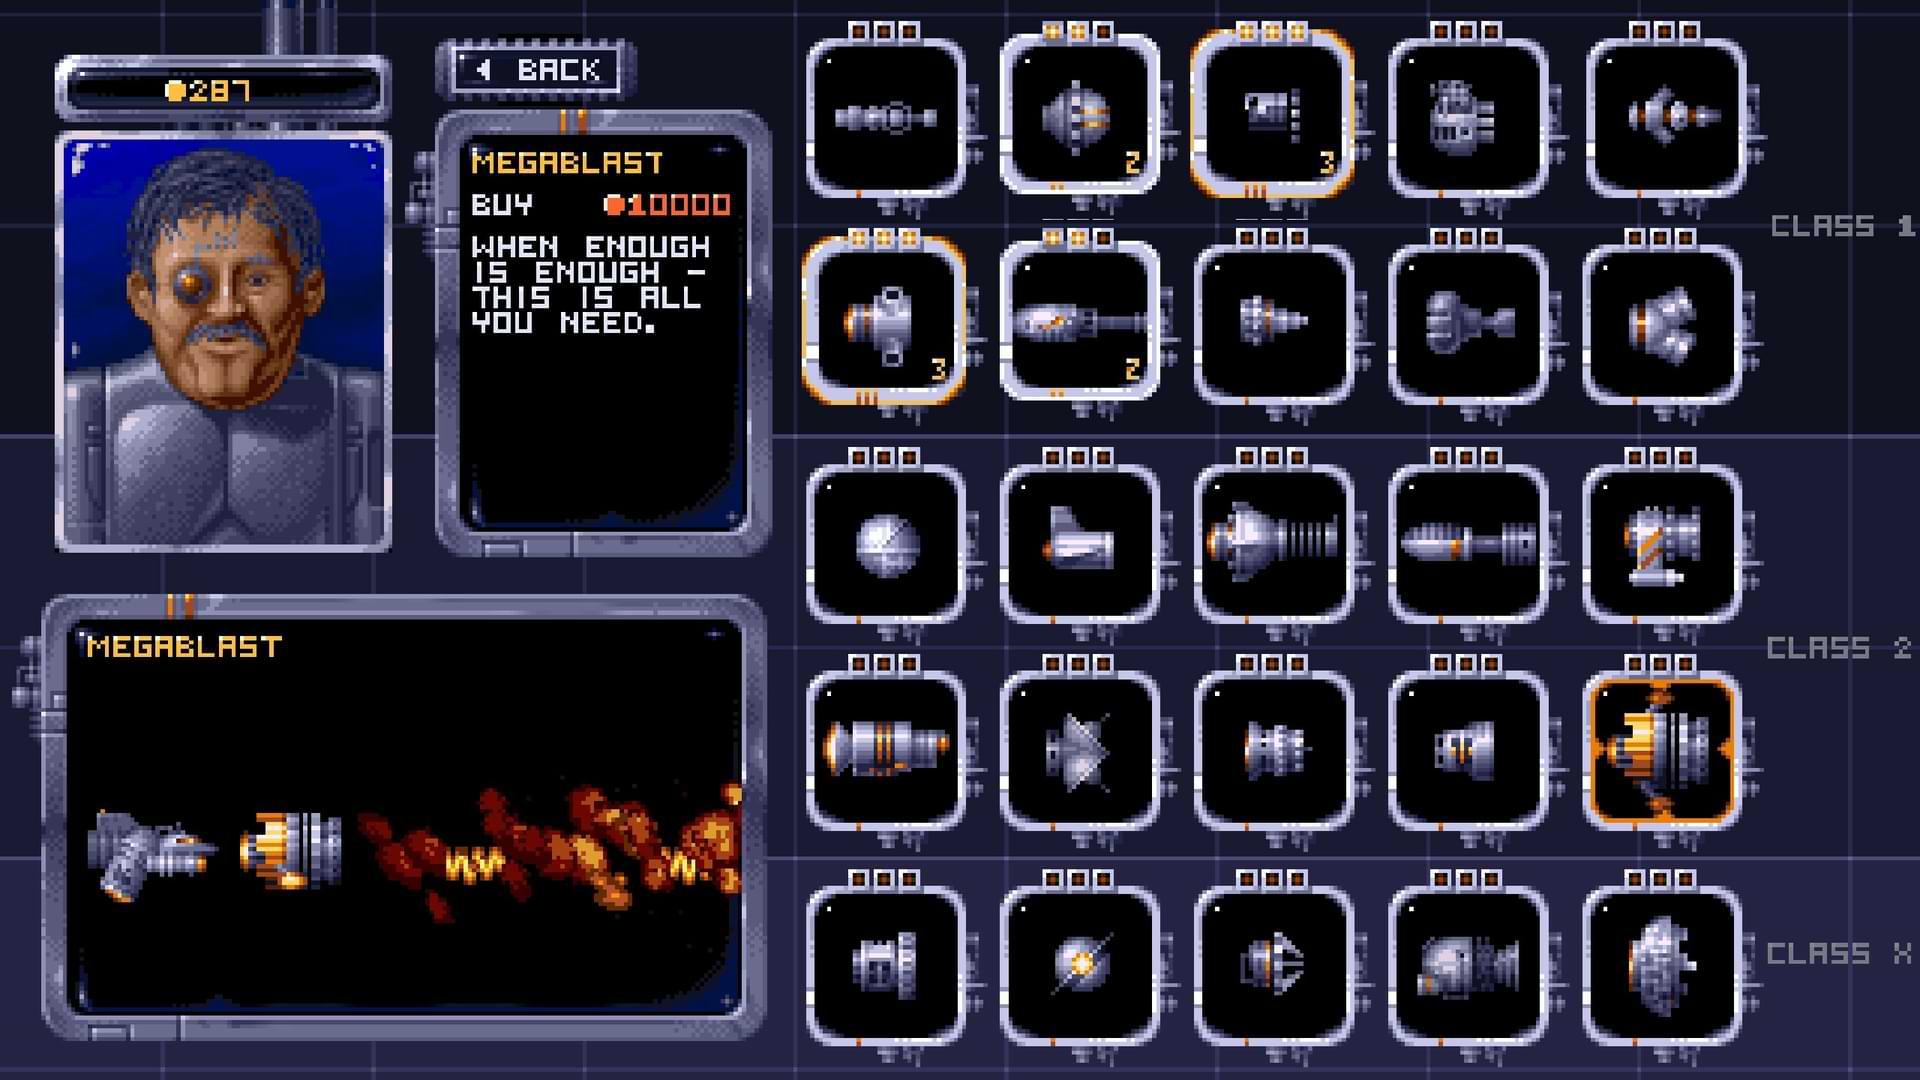 1993 Space Machine - Shop